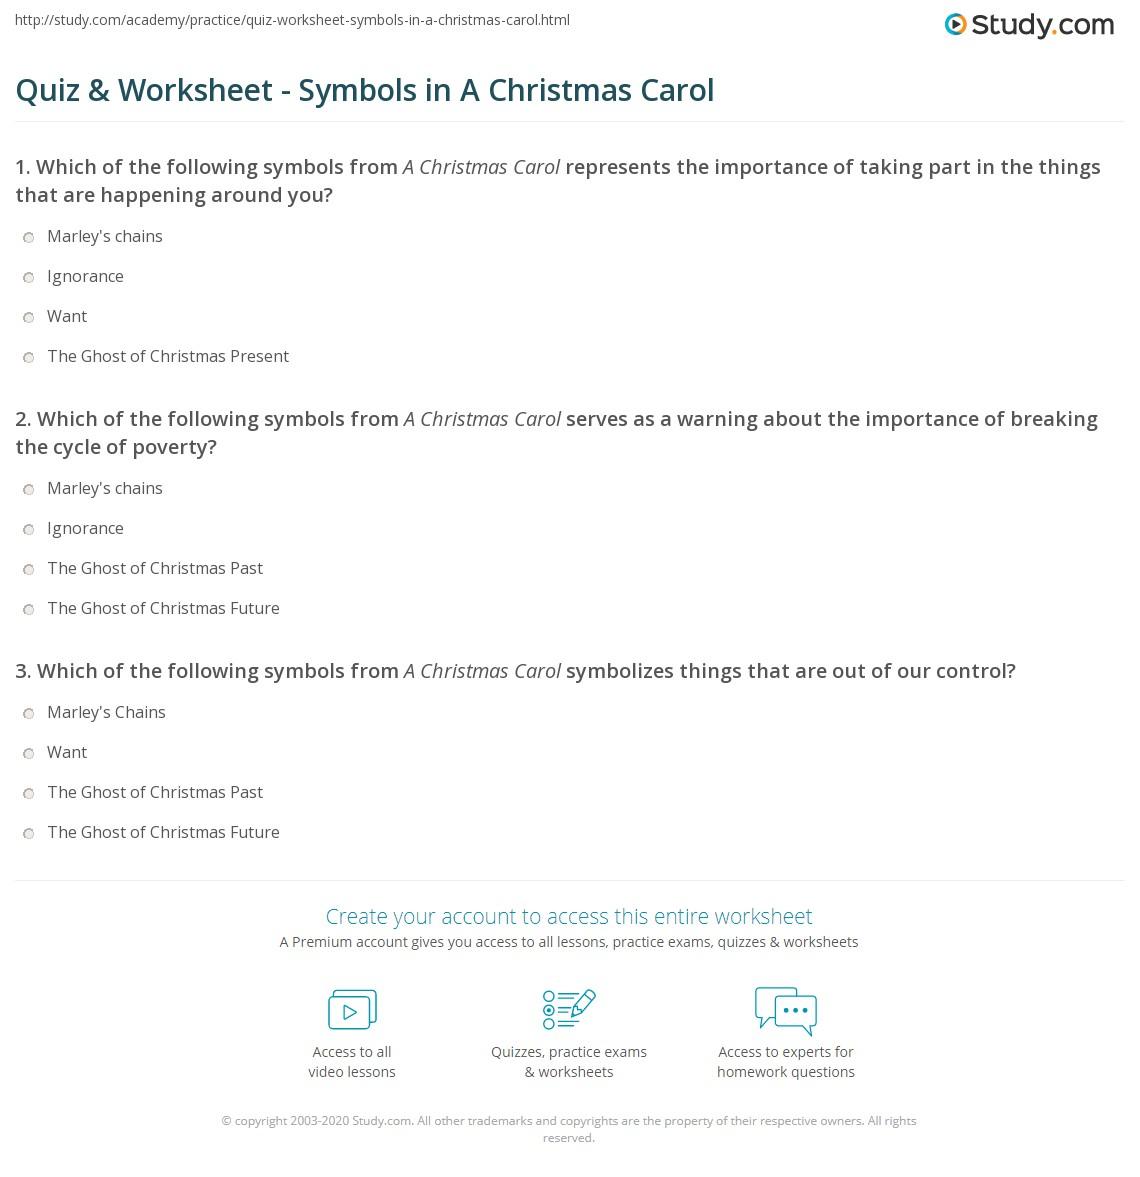 A Christmas Carol Symbols Worksheet